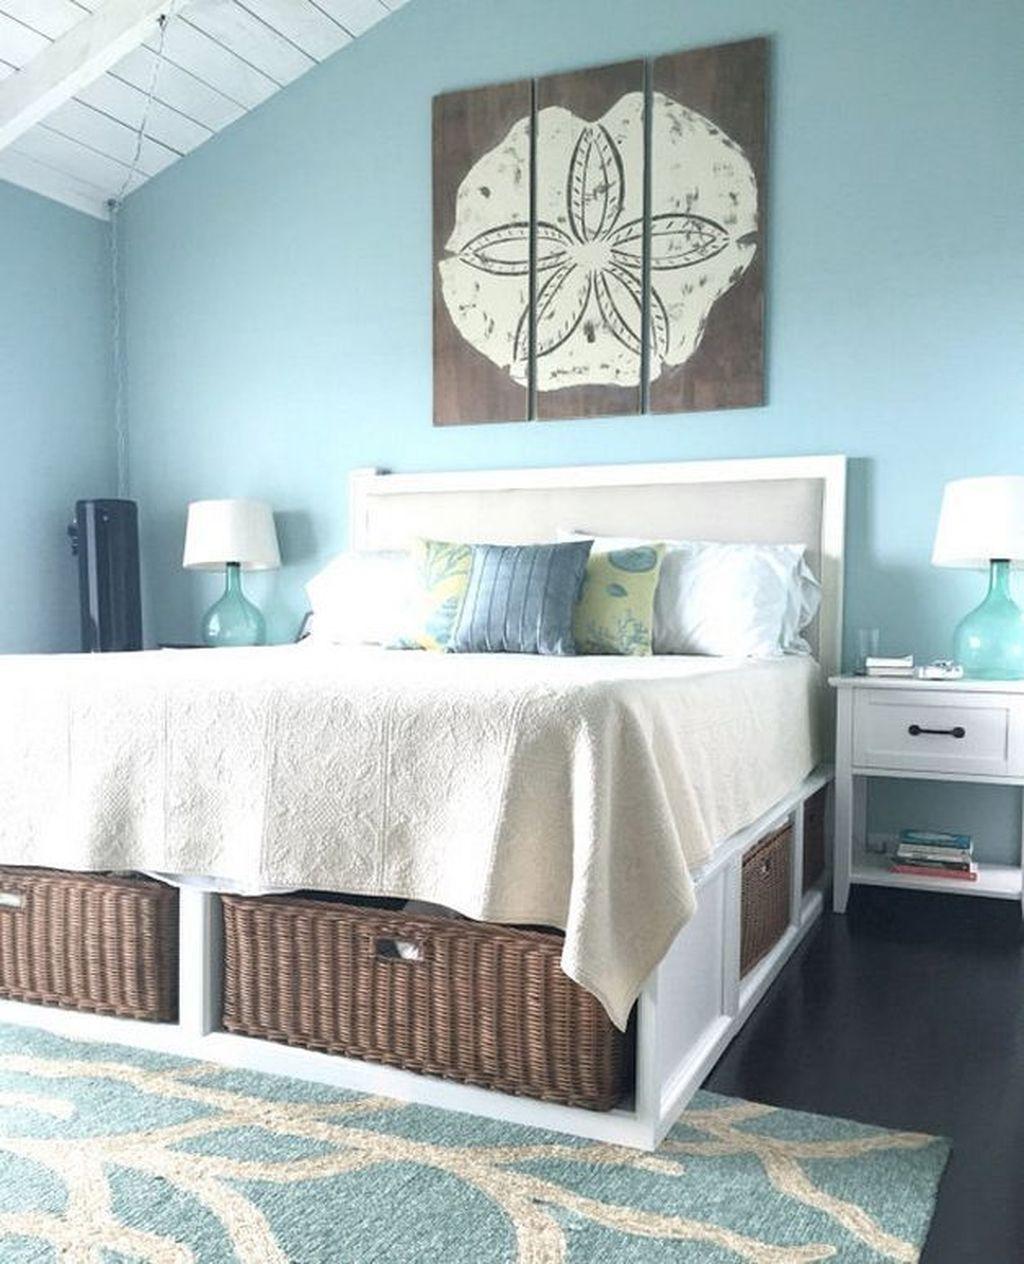 Modern Coastal Bedroom Ideas: Awesome 99 Modern Coastal Master Bedroom Decorating Ideas